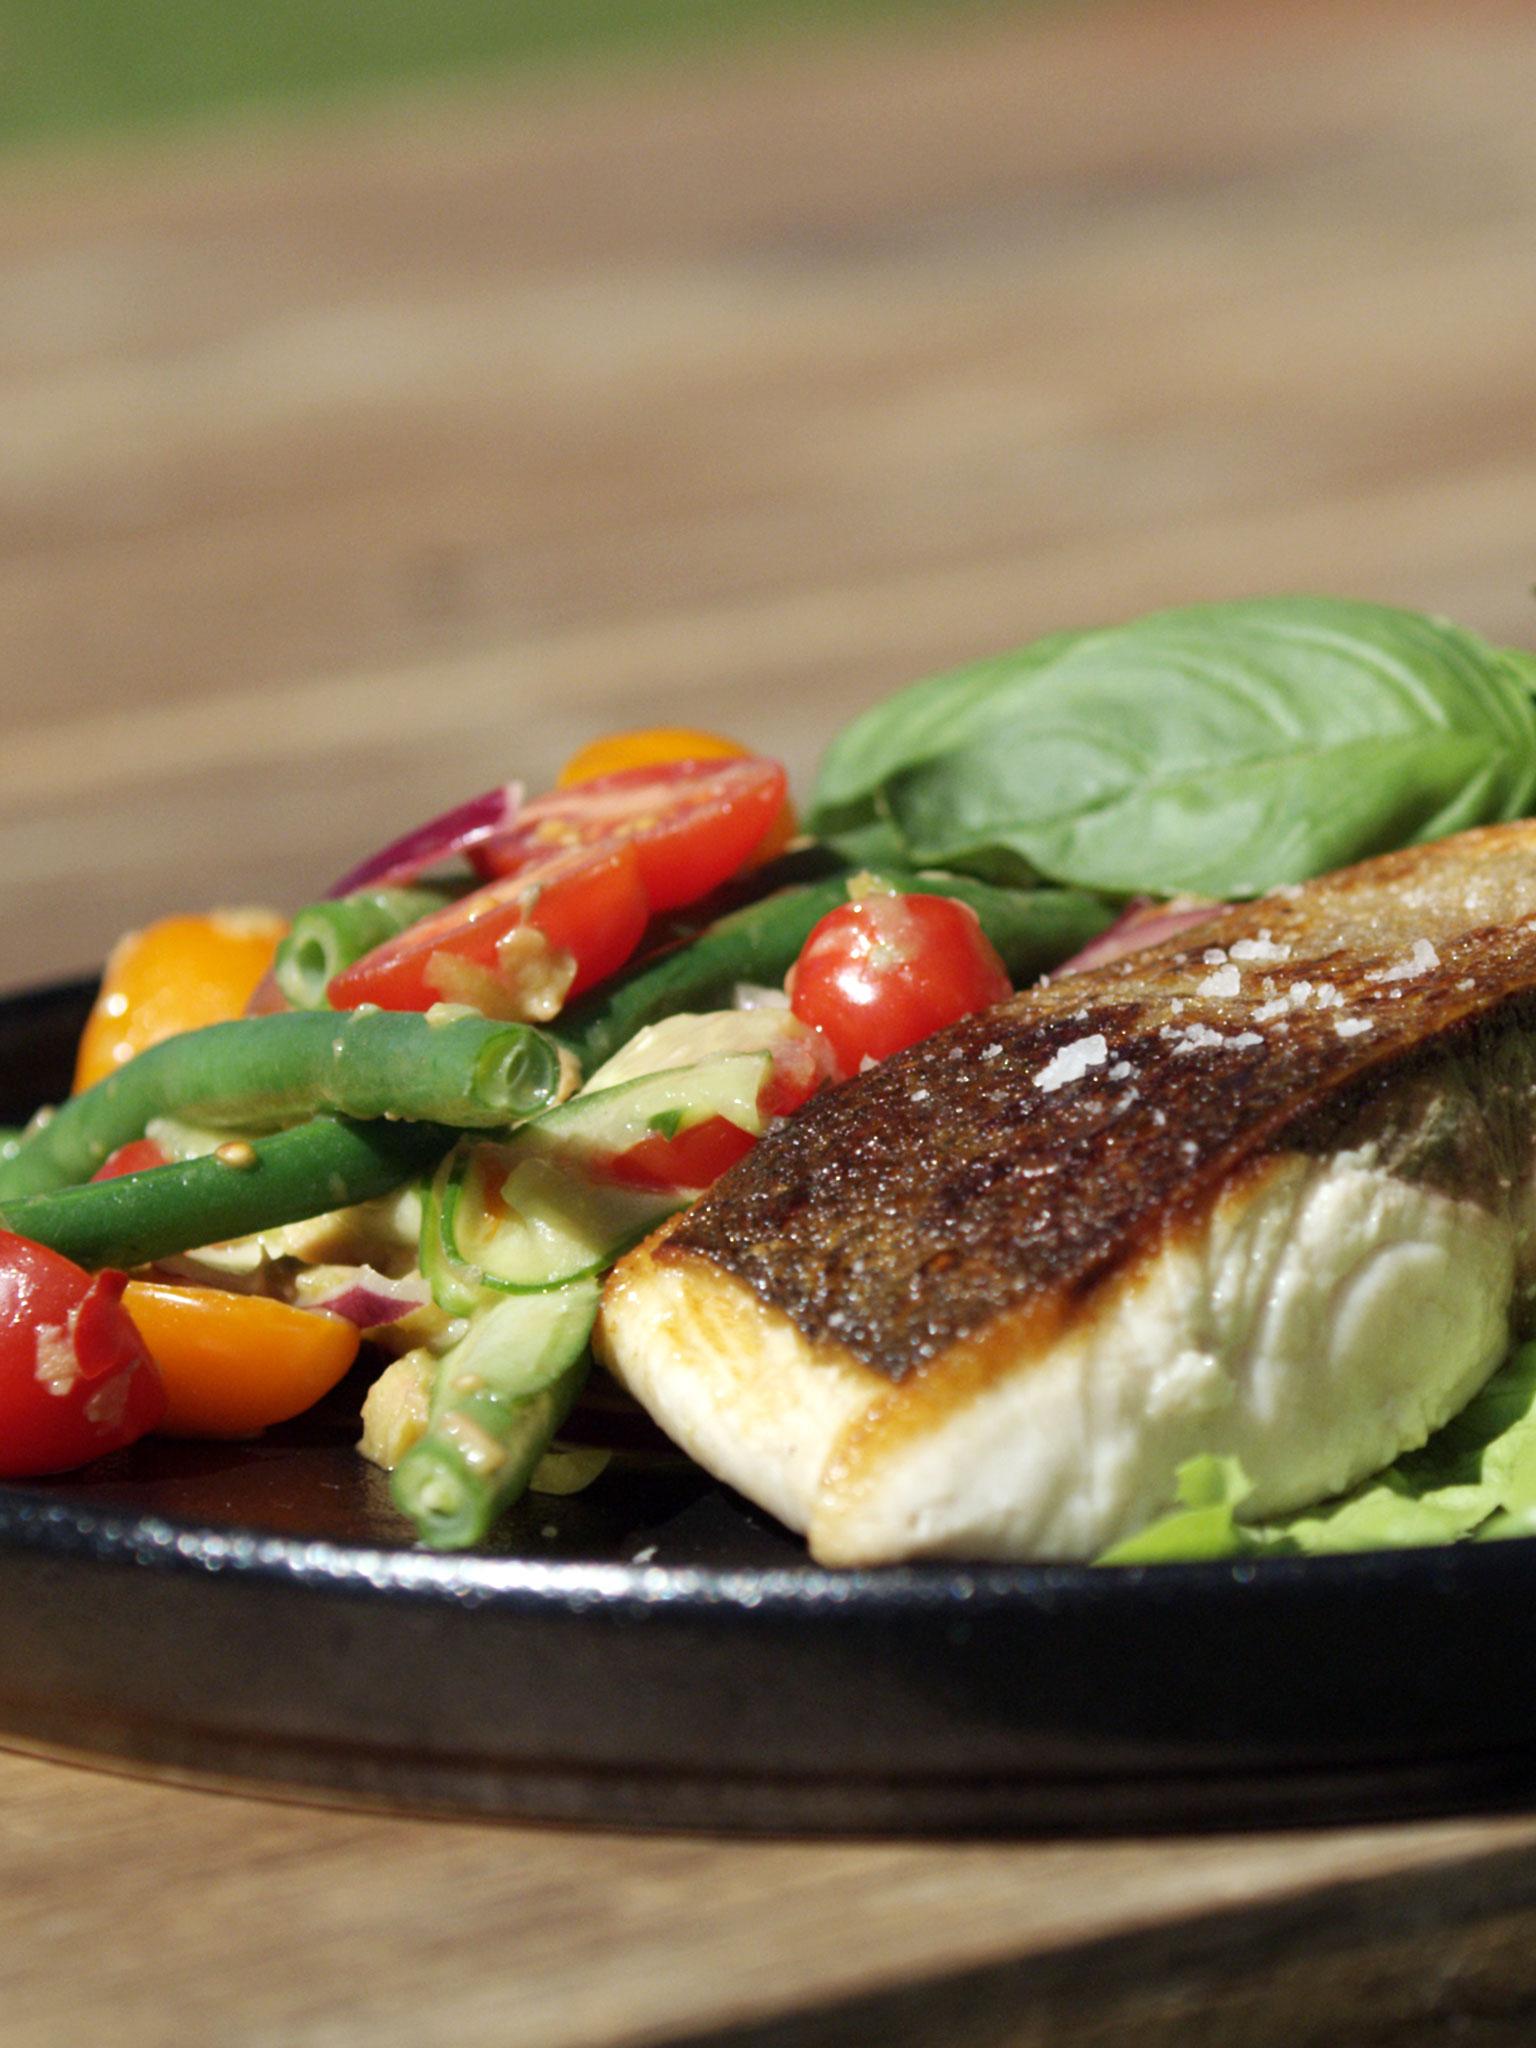 2-109-Kingfish-Salad-with-Green-Olive-Dressing-web.jpg